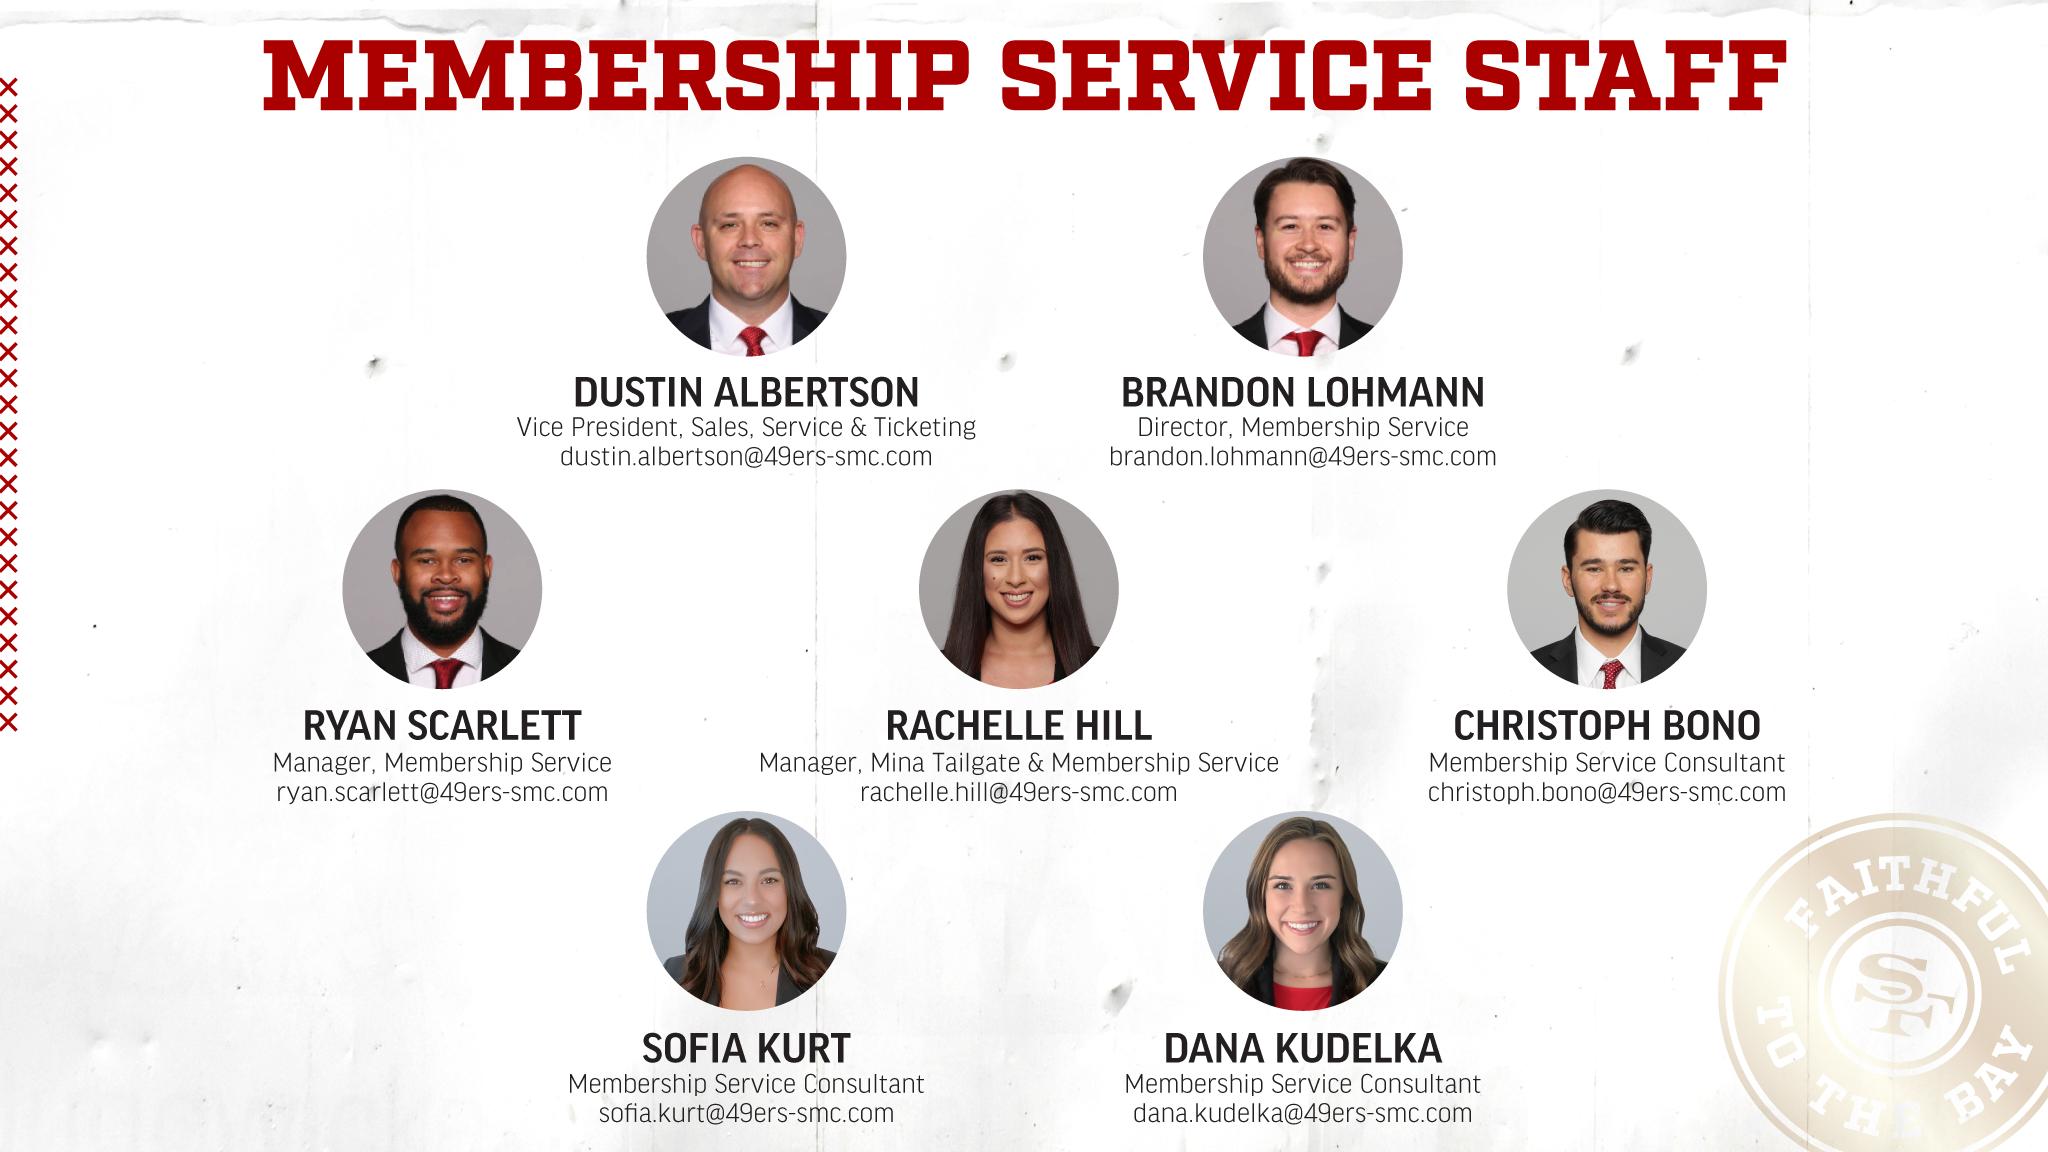 MembershipServiceStaff